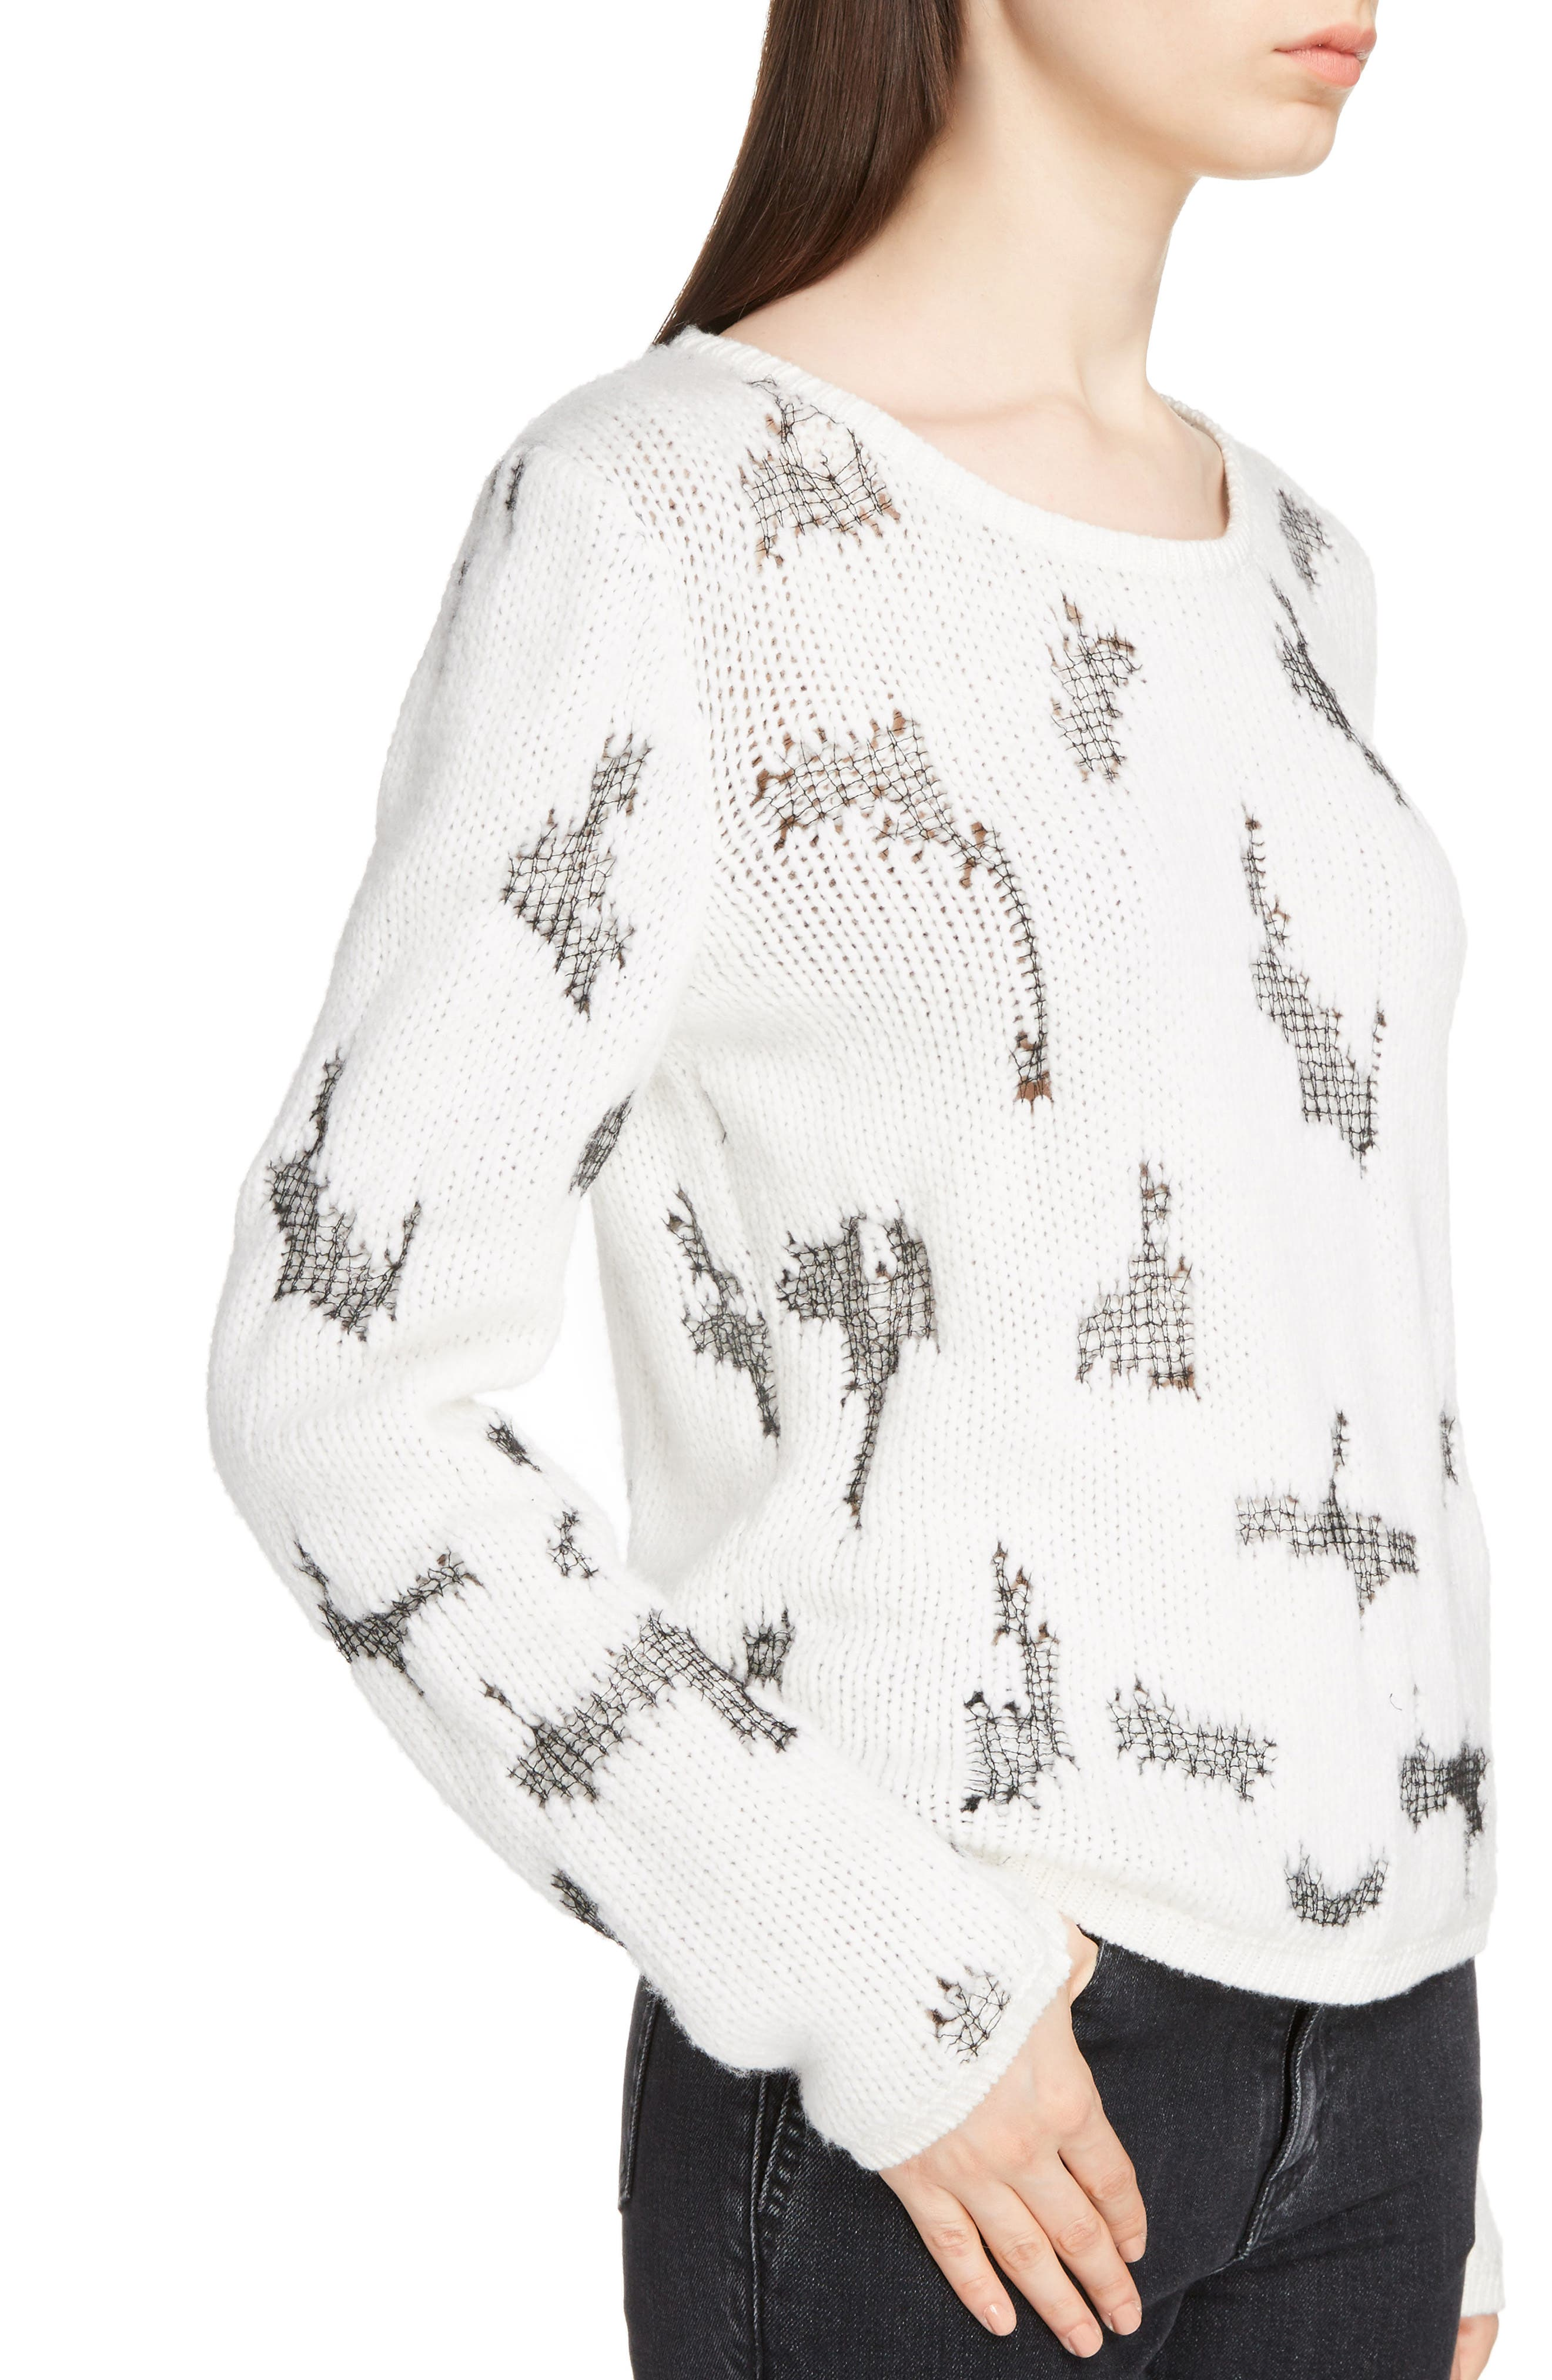 Distressed Cashmere Blend Sweater,                             Alternate thumbnail 4, color,                             Naturel/ Noir